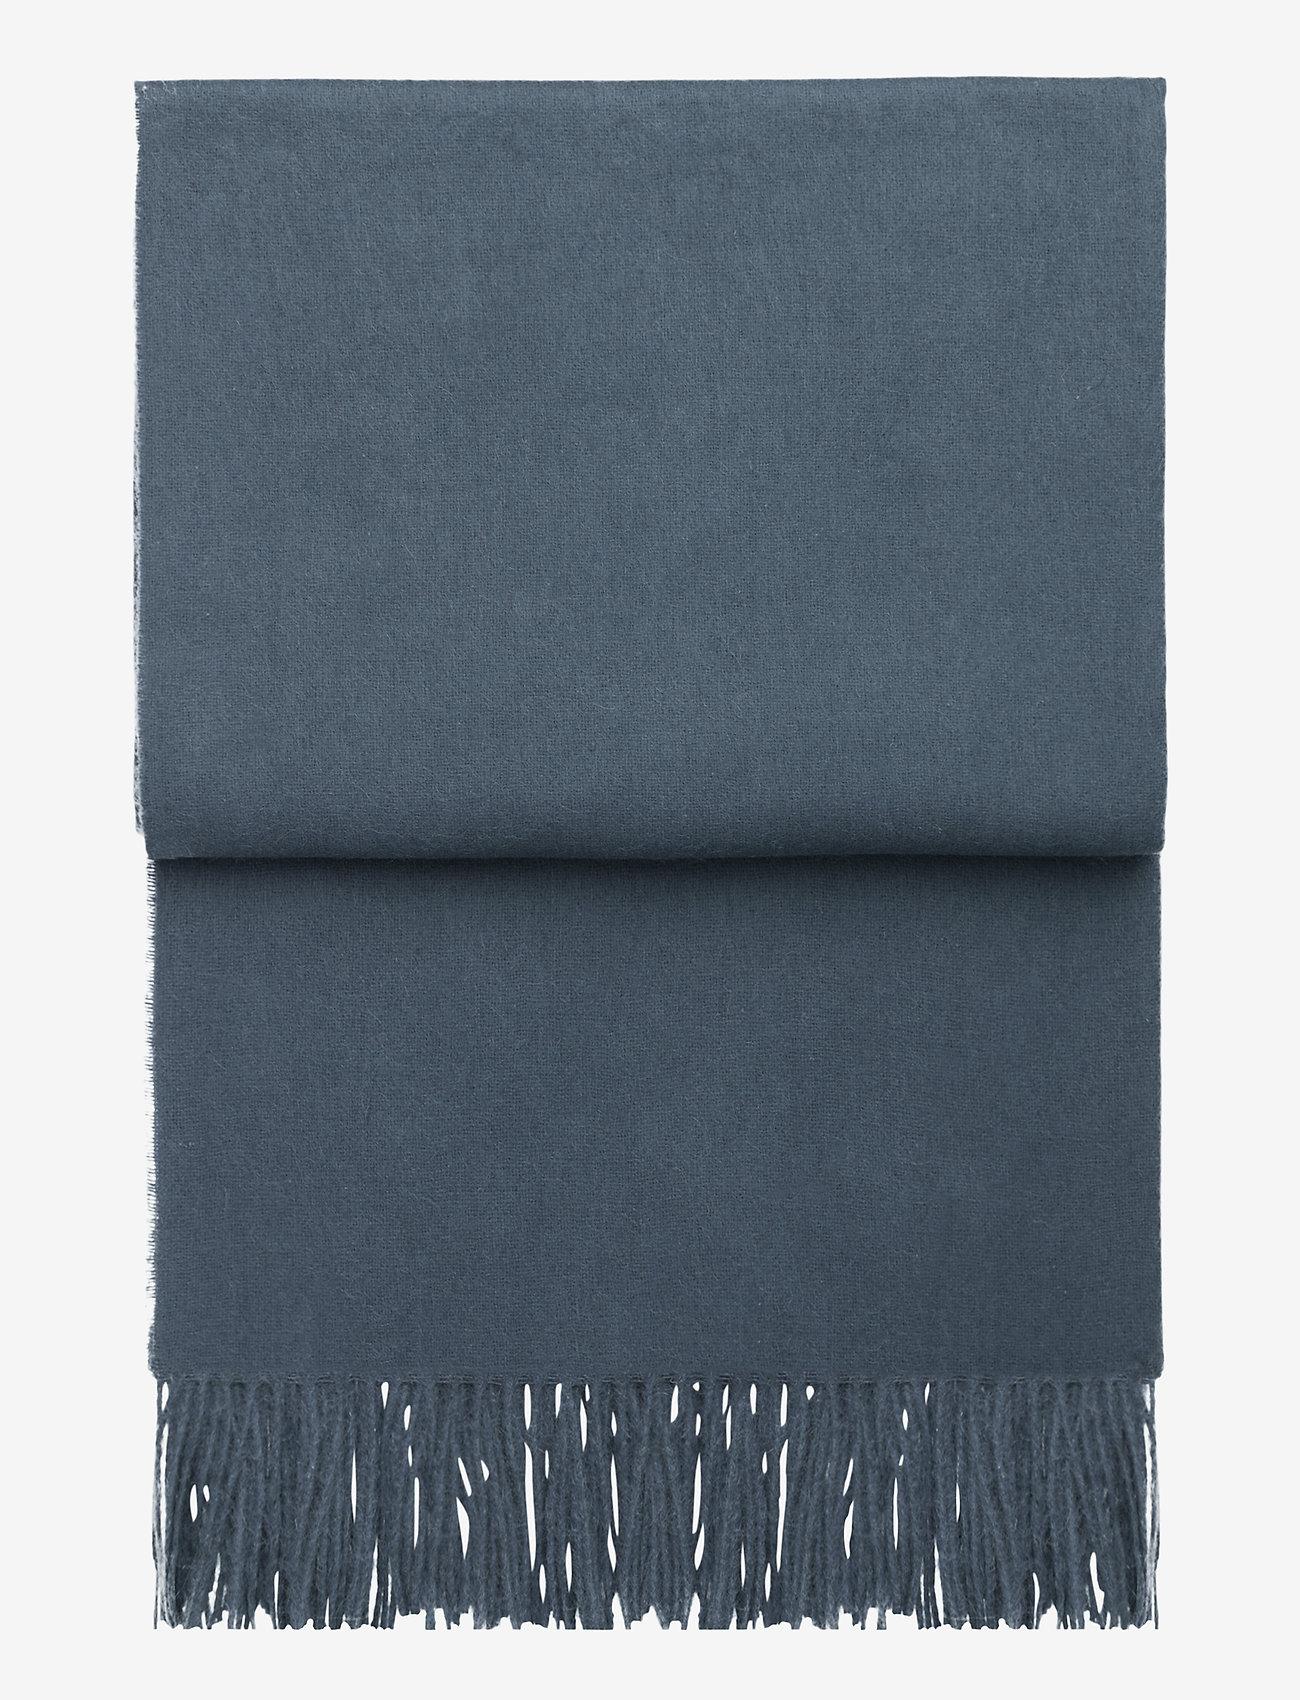 Elvang - Classic plaid - mellem 1000-2000 kr - midnight blue - 0